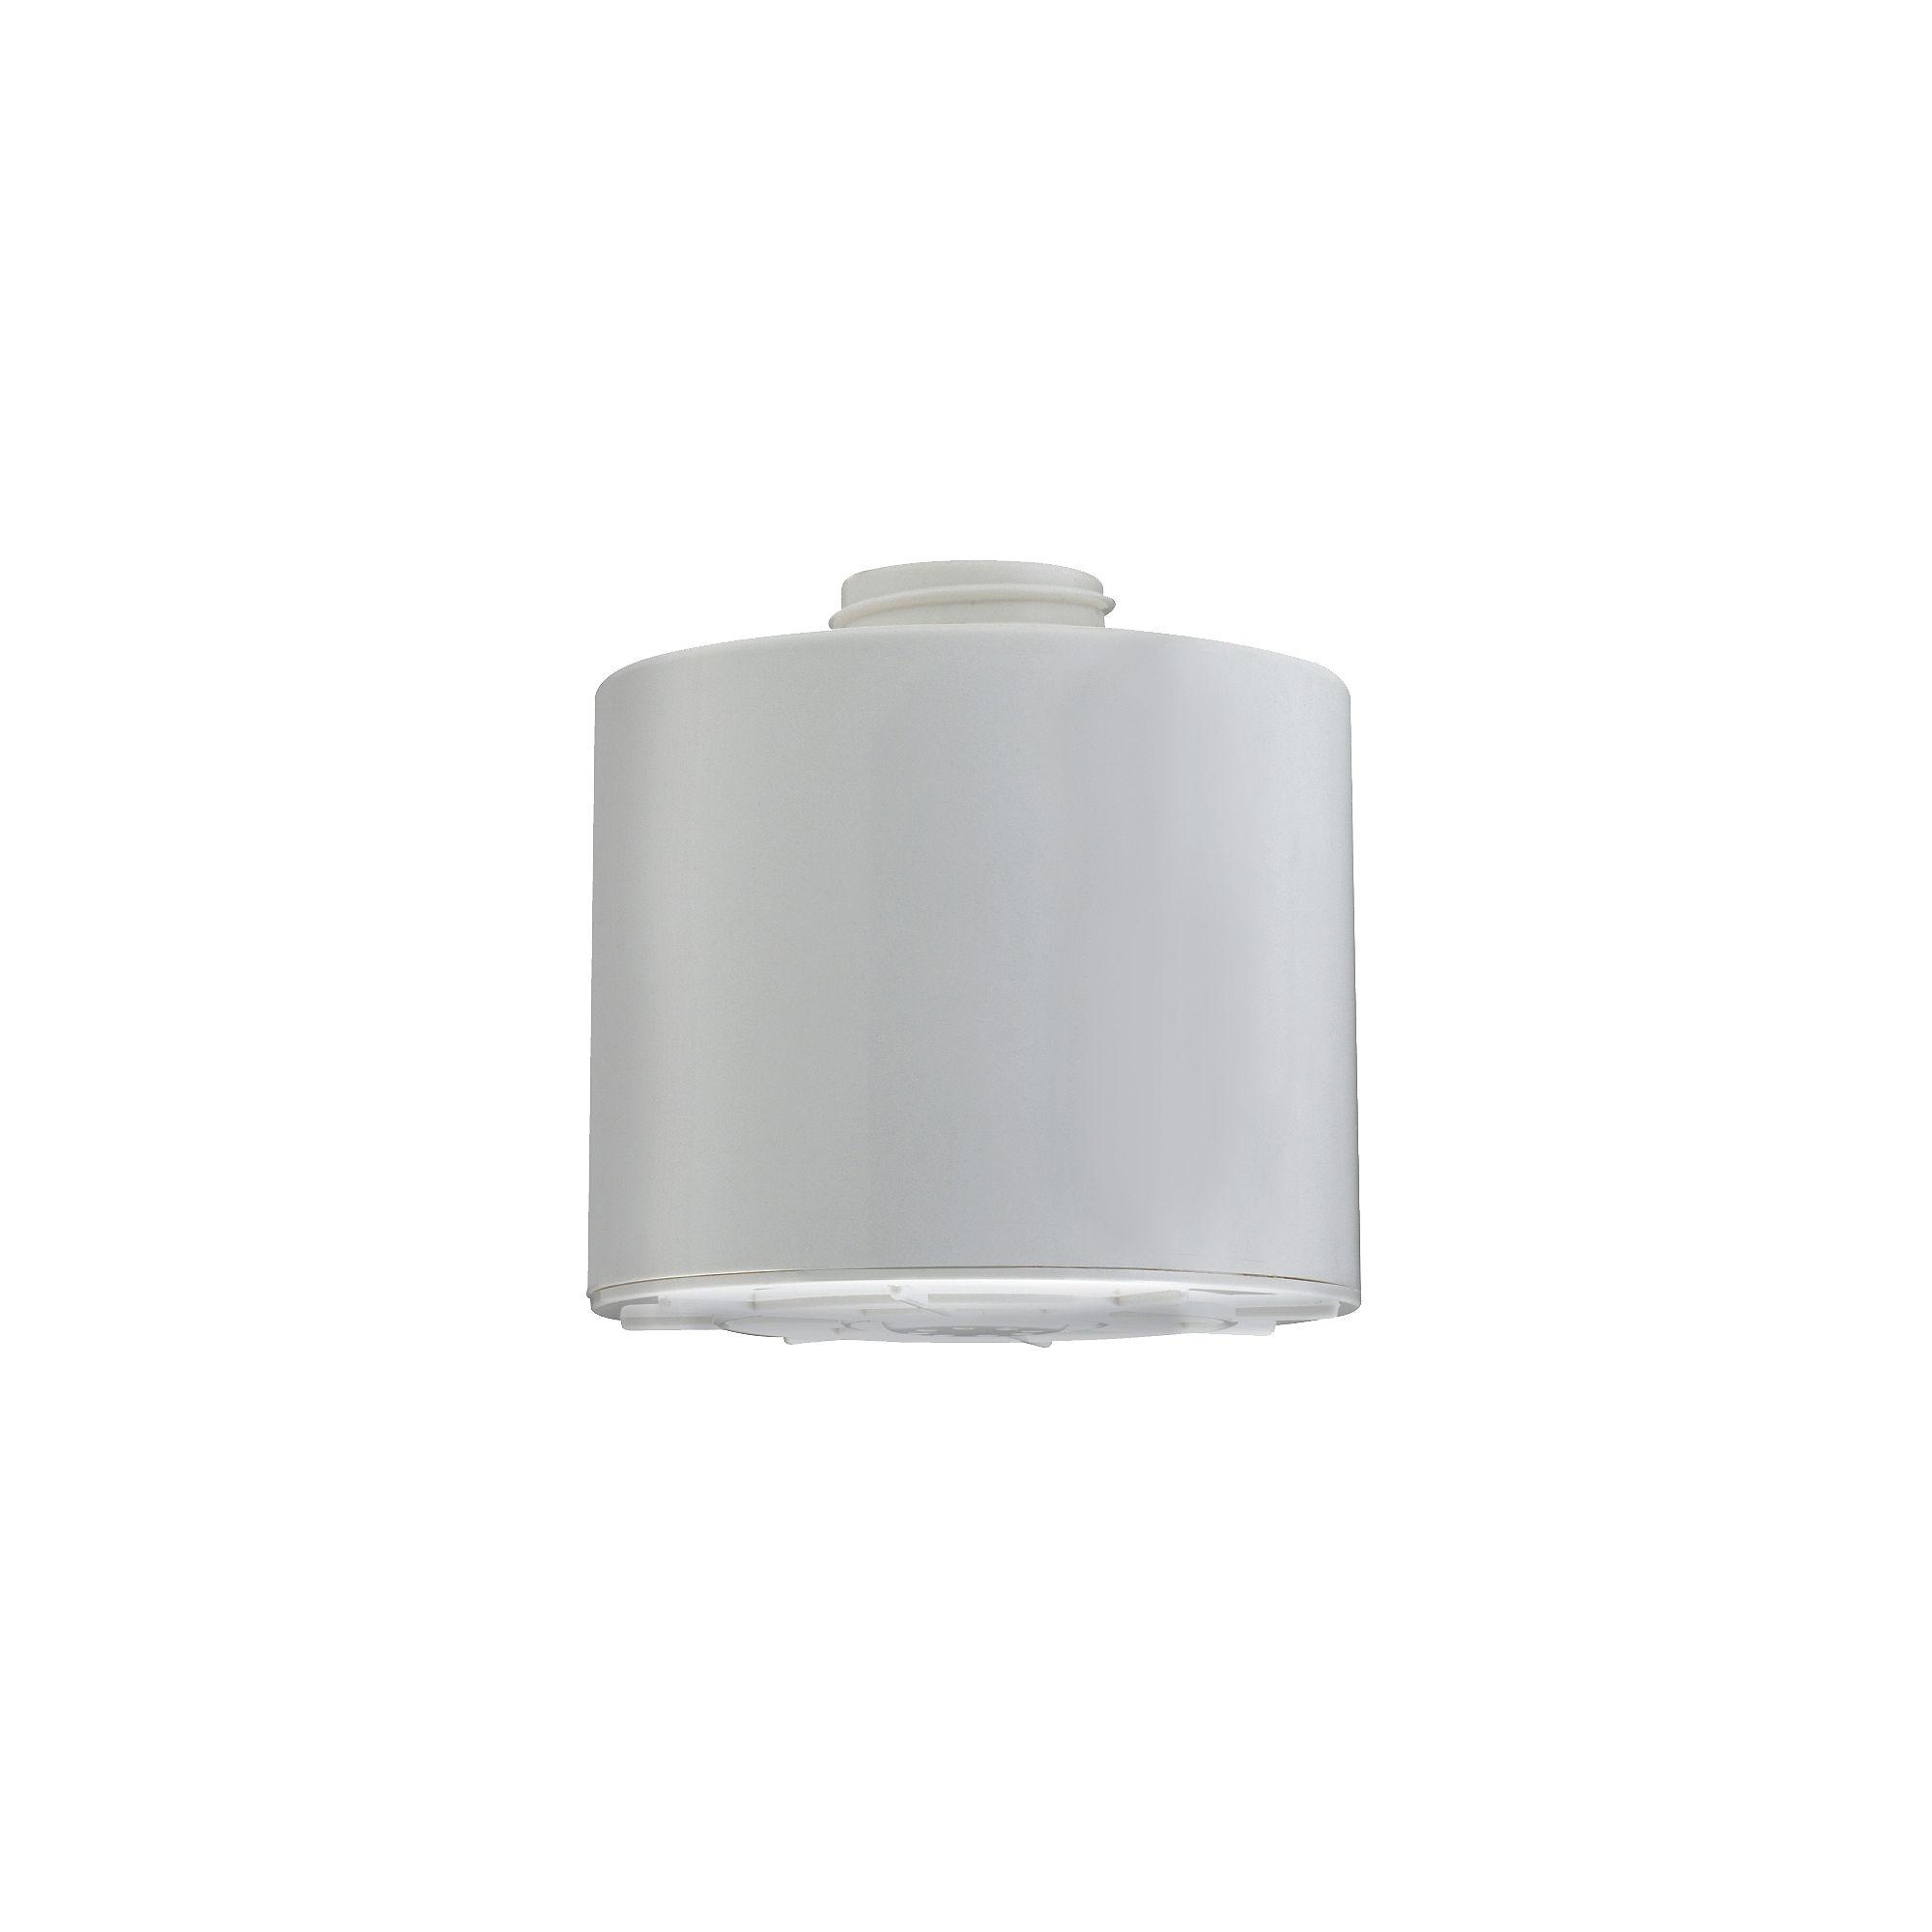 PUREGUARDIAN FLTDC Filter